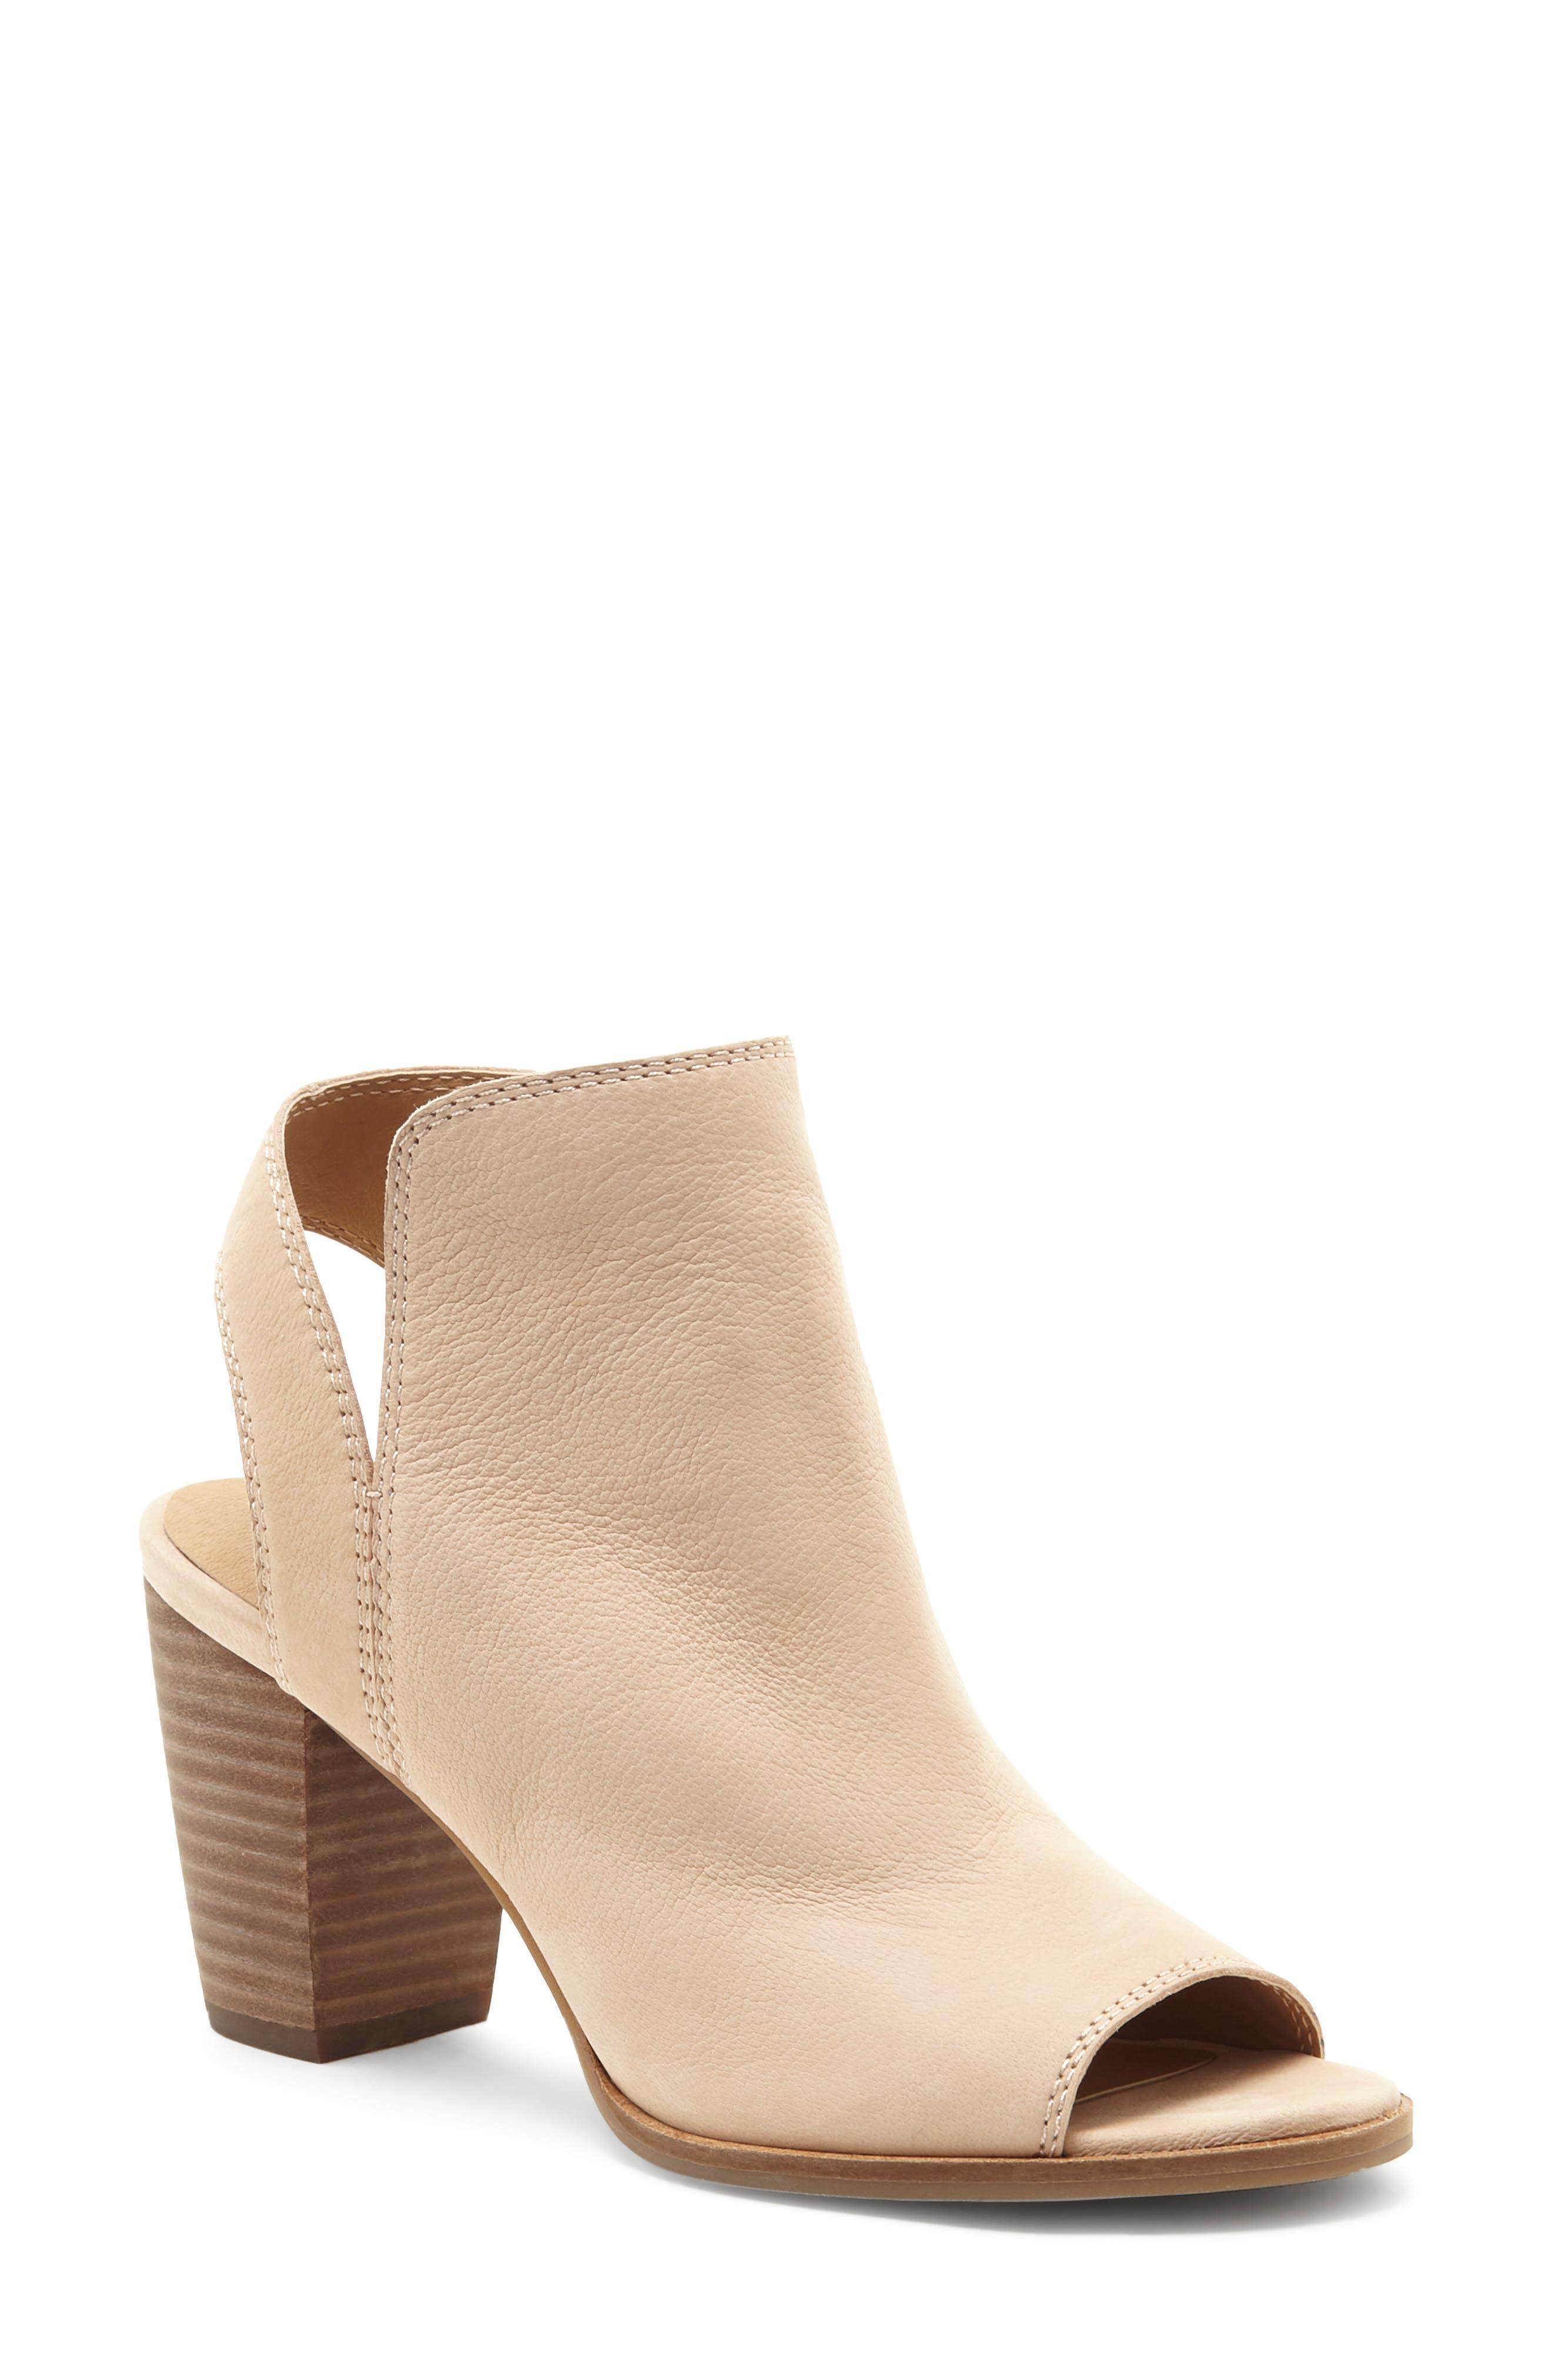 Lucky Brand Jubai Sandal- Beige